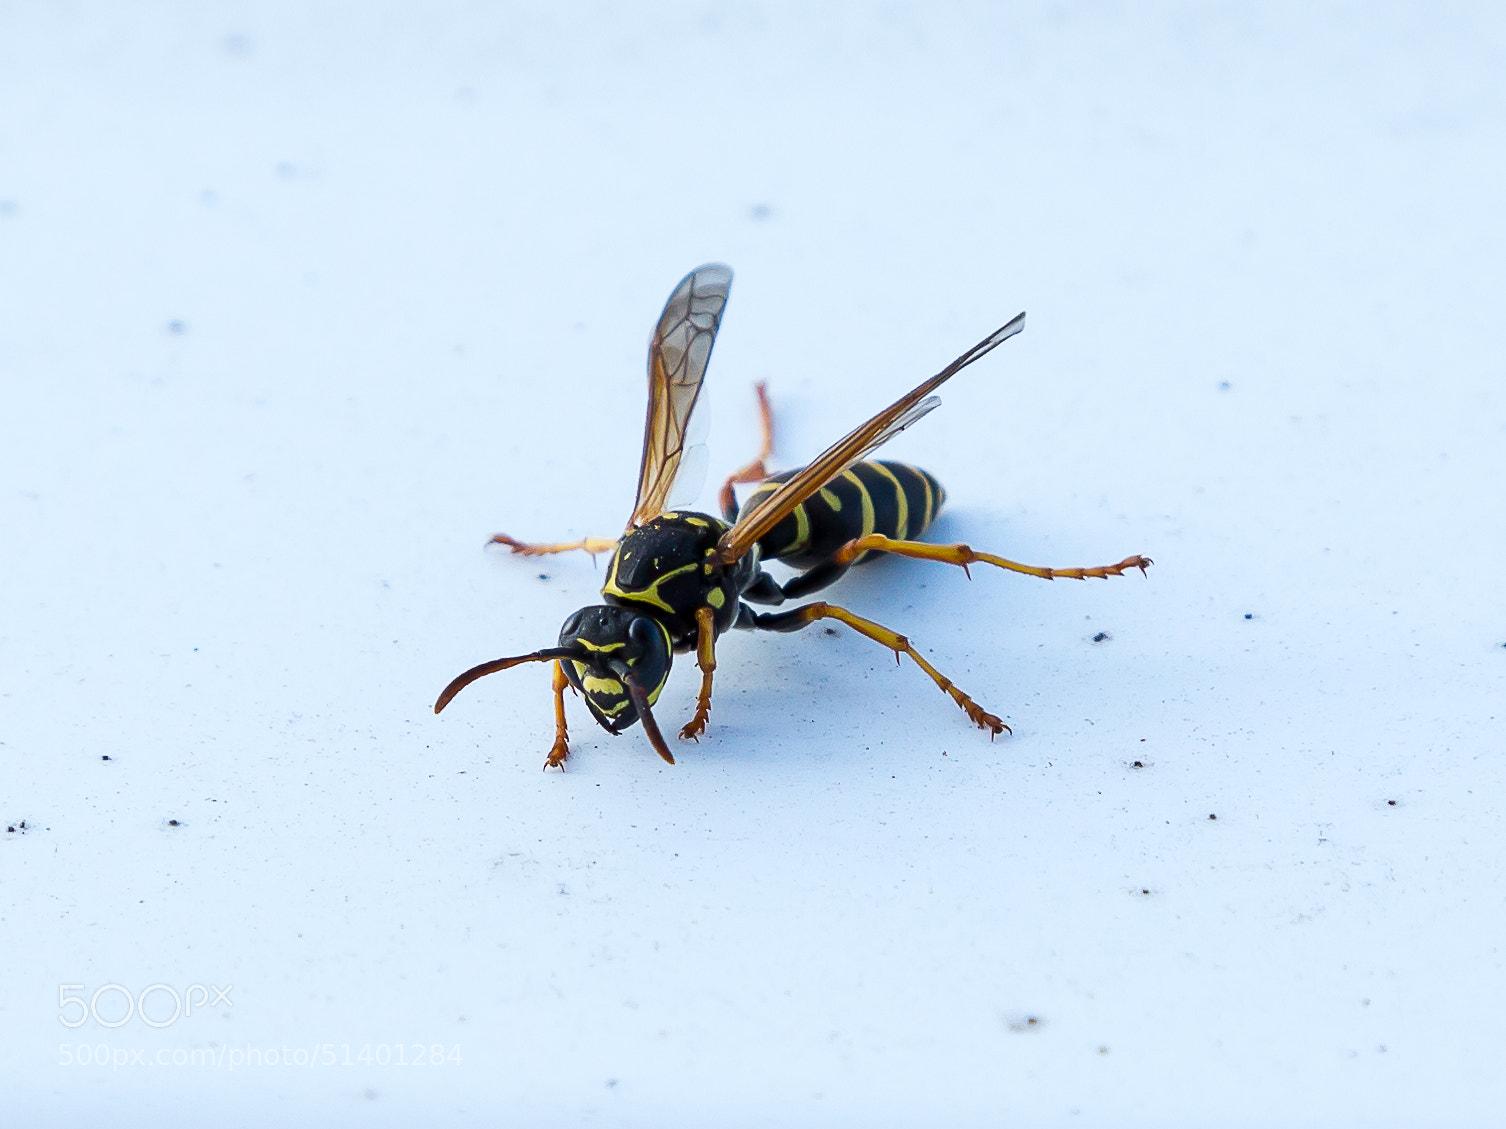 Photograph bug by Maxim Mironov on 500px